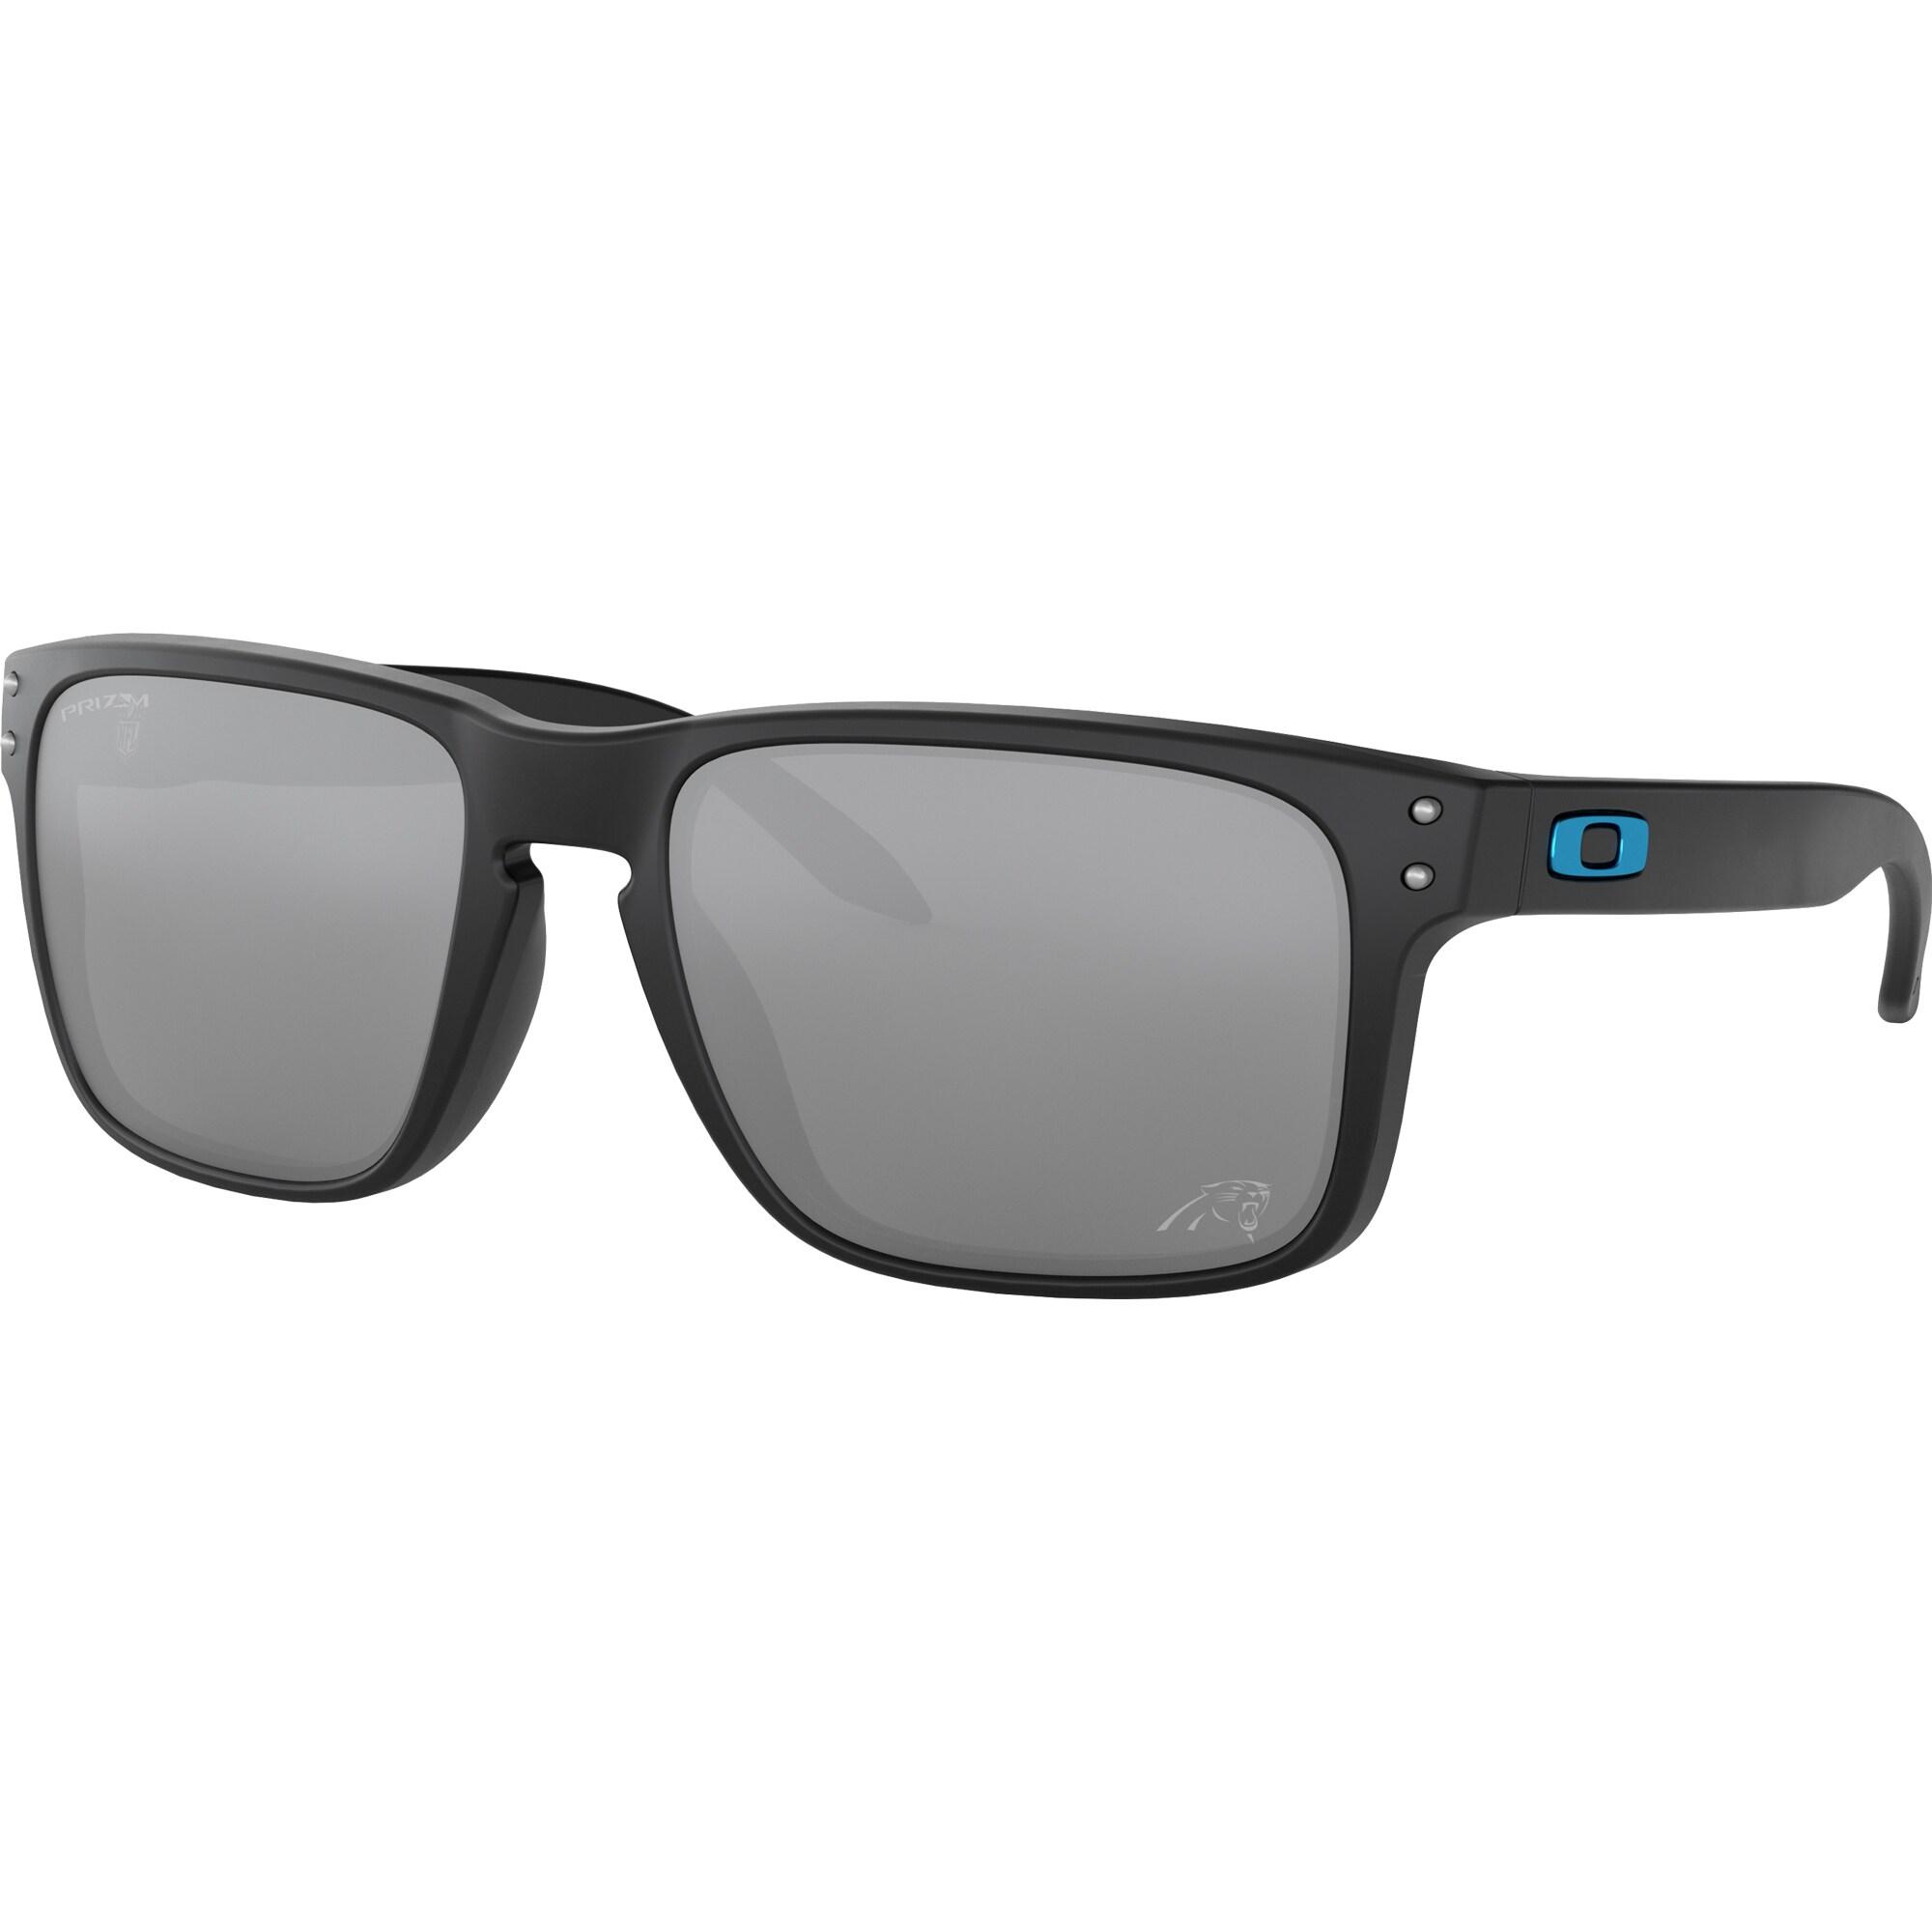 Carolina Panthers Oakley Holbrook Sunglasses